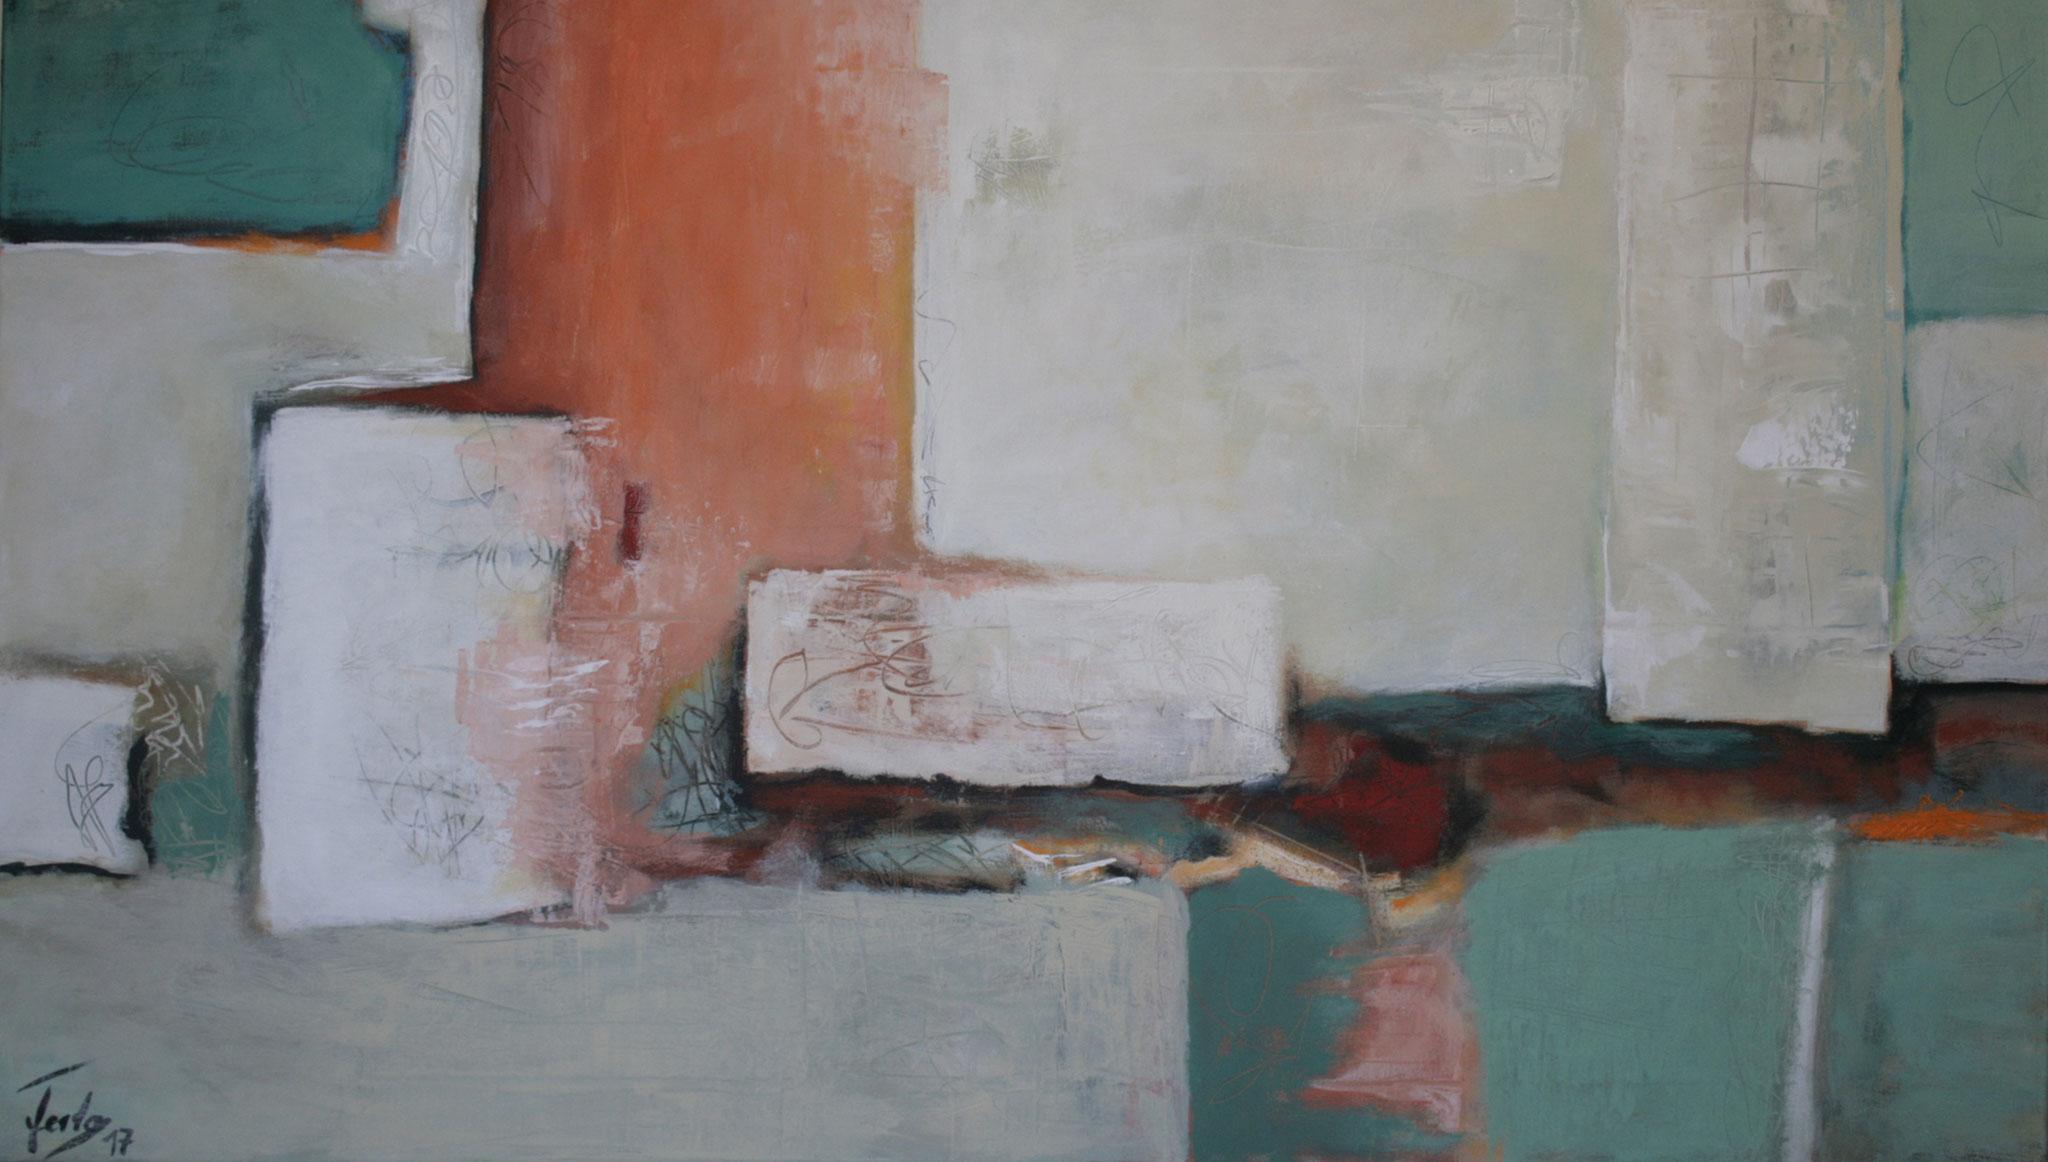 Ohne Titel 1704, Öl und Acryl auf Leinwand, 80 x 140 cm